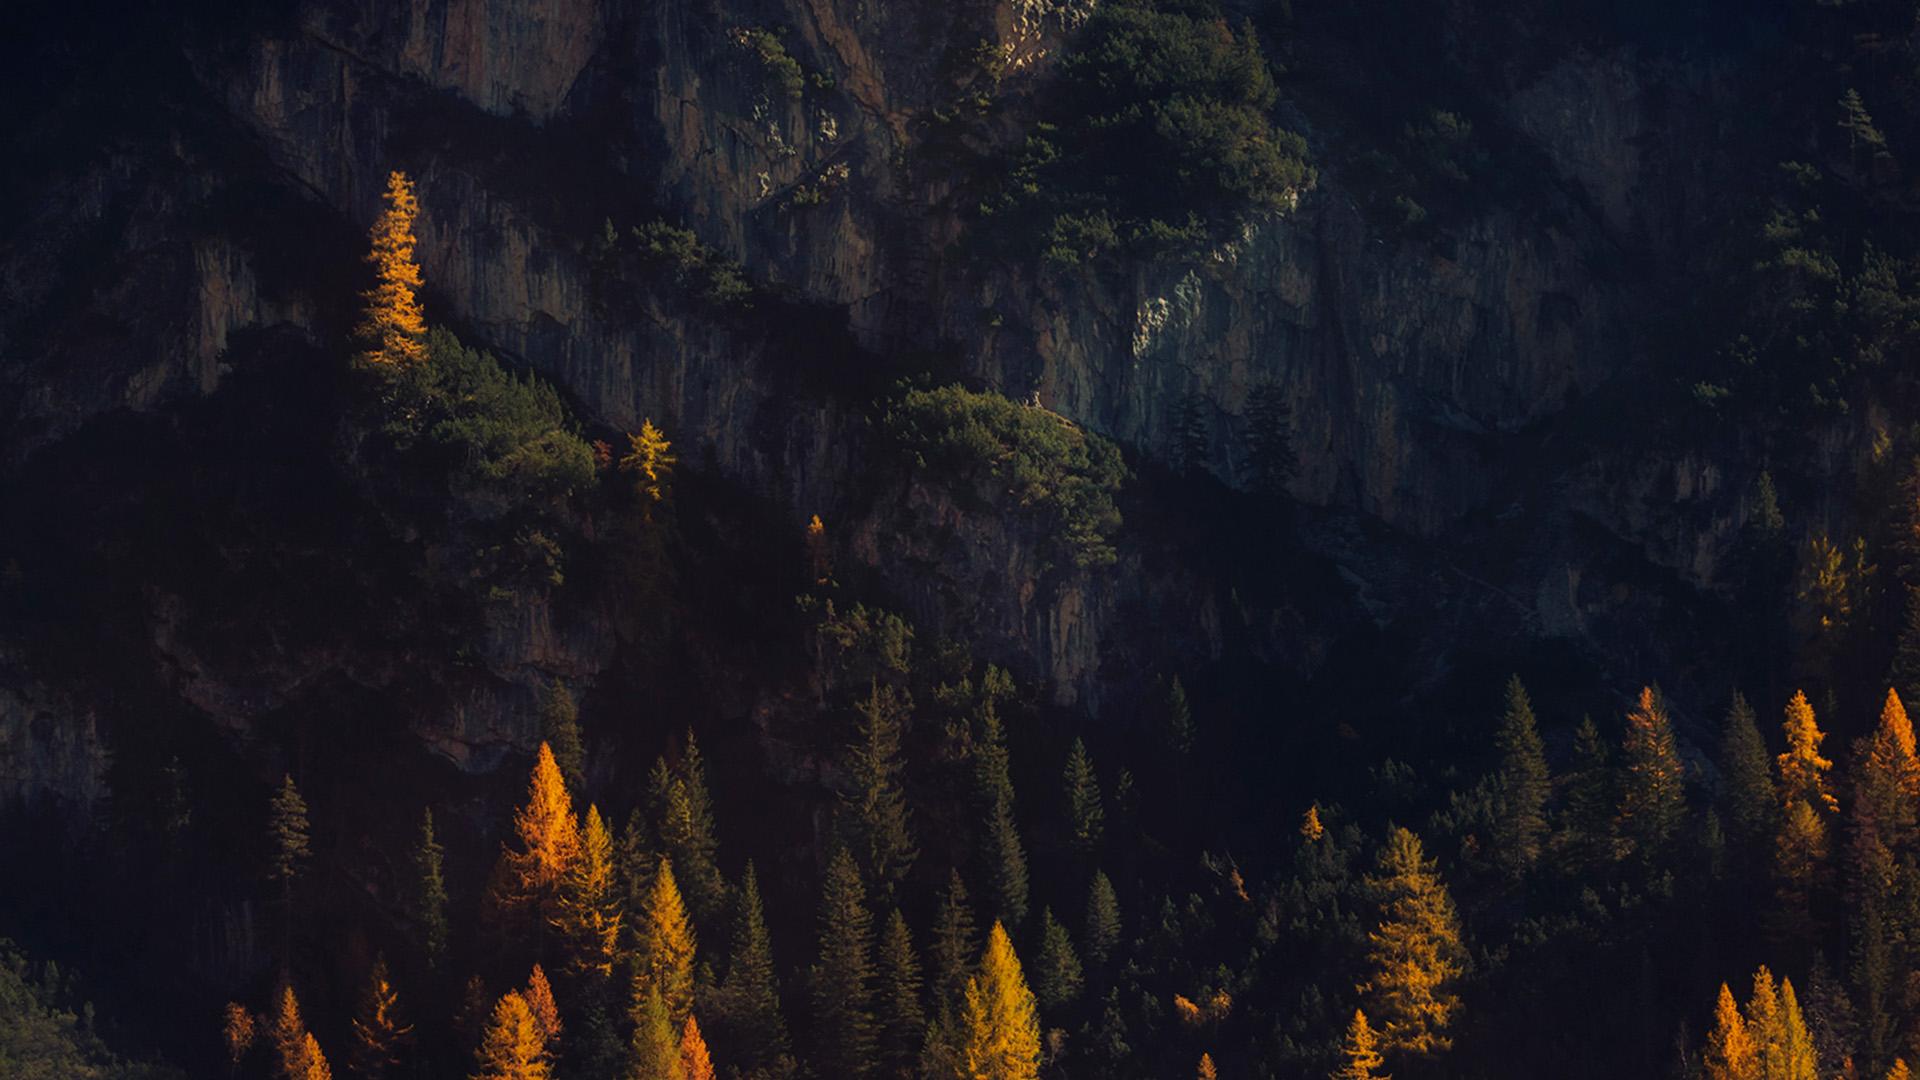 nz49-wood-tree-fall-mountain-nature-wallpaper